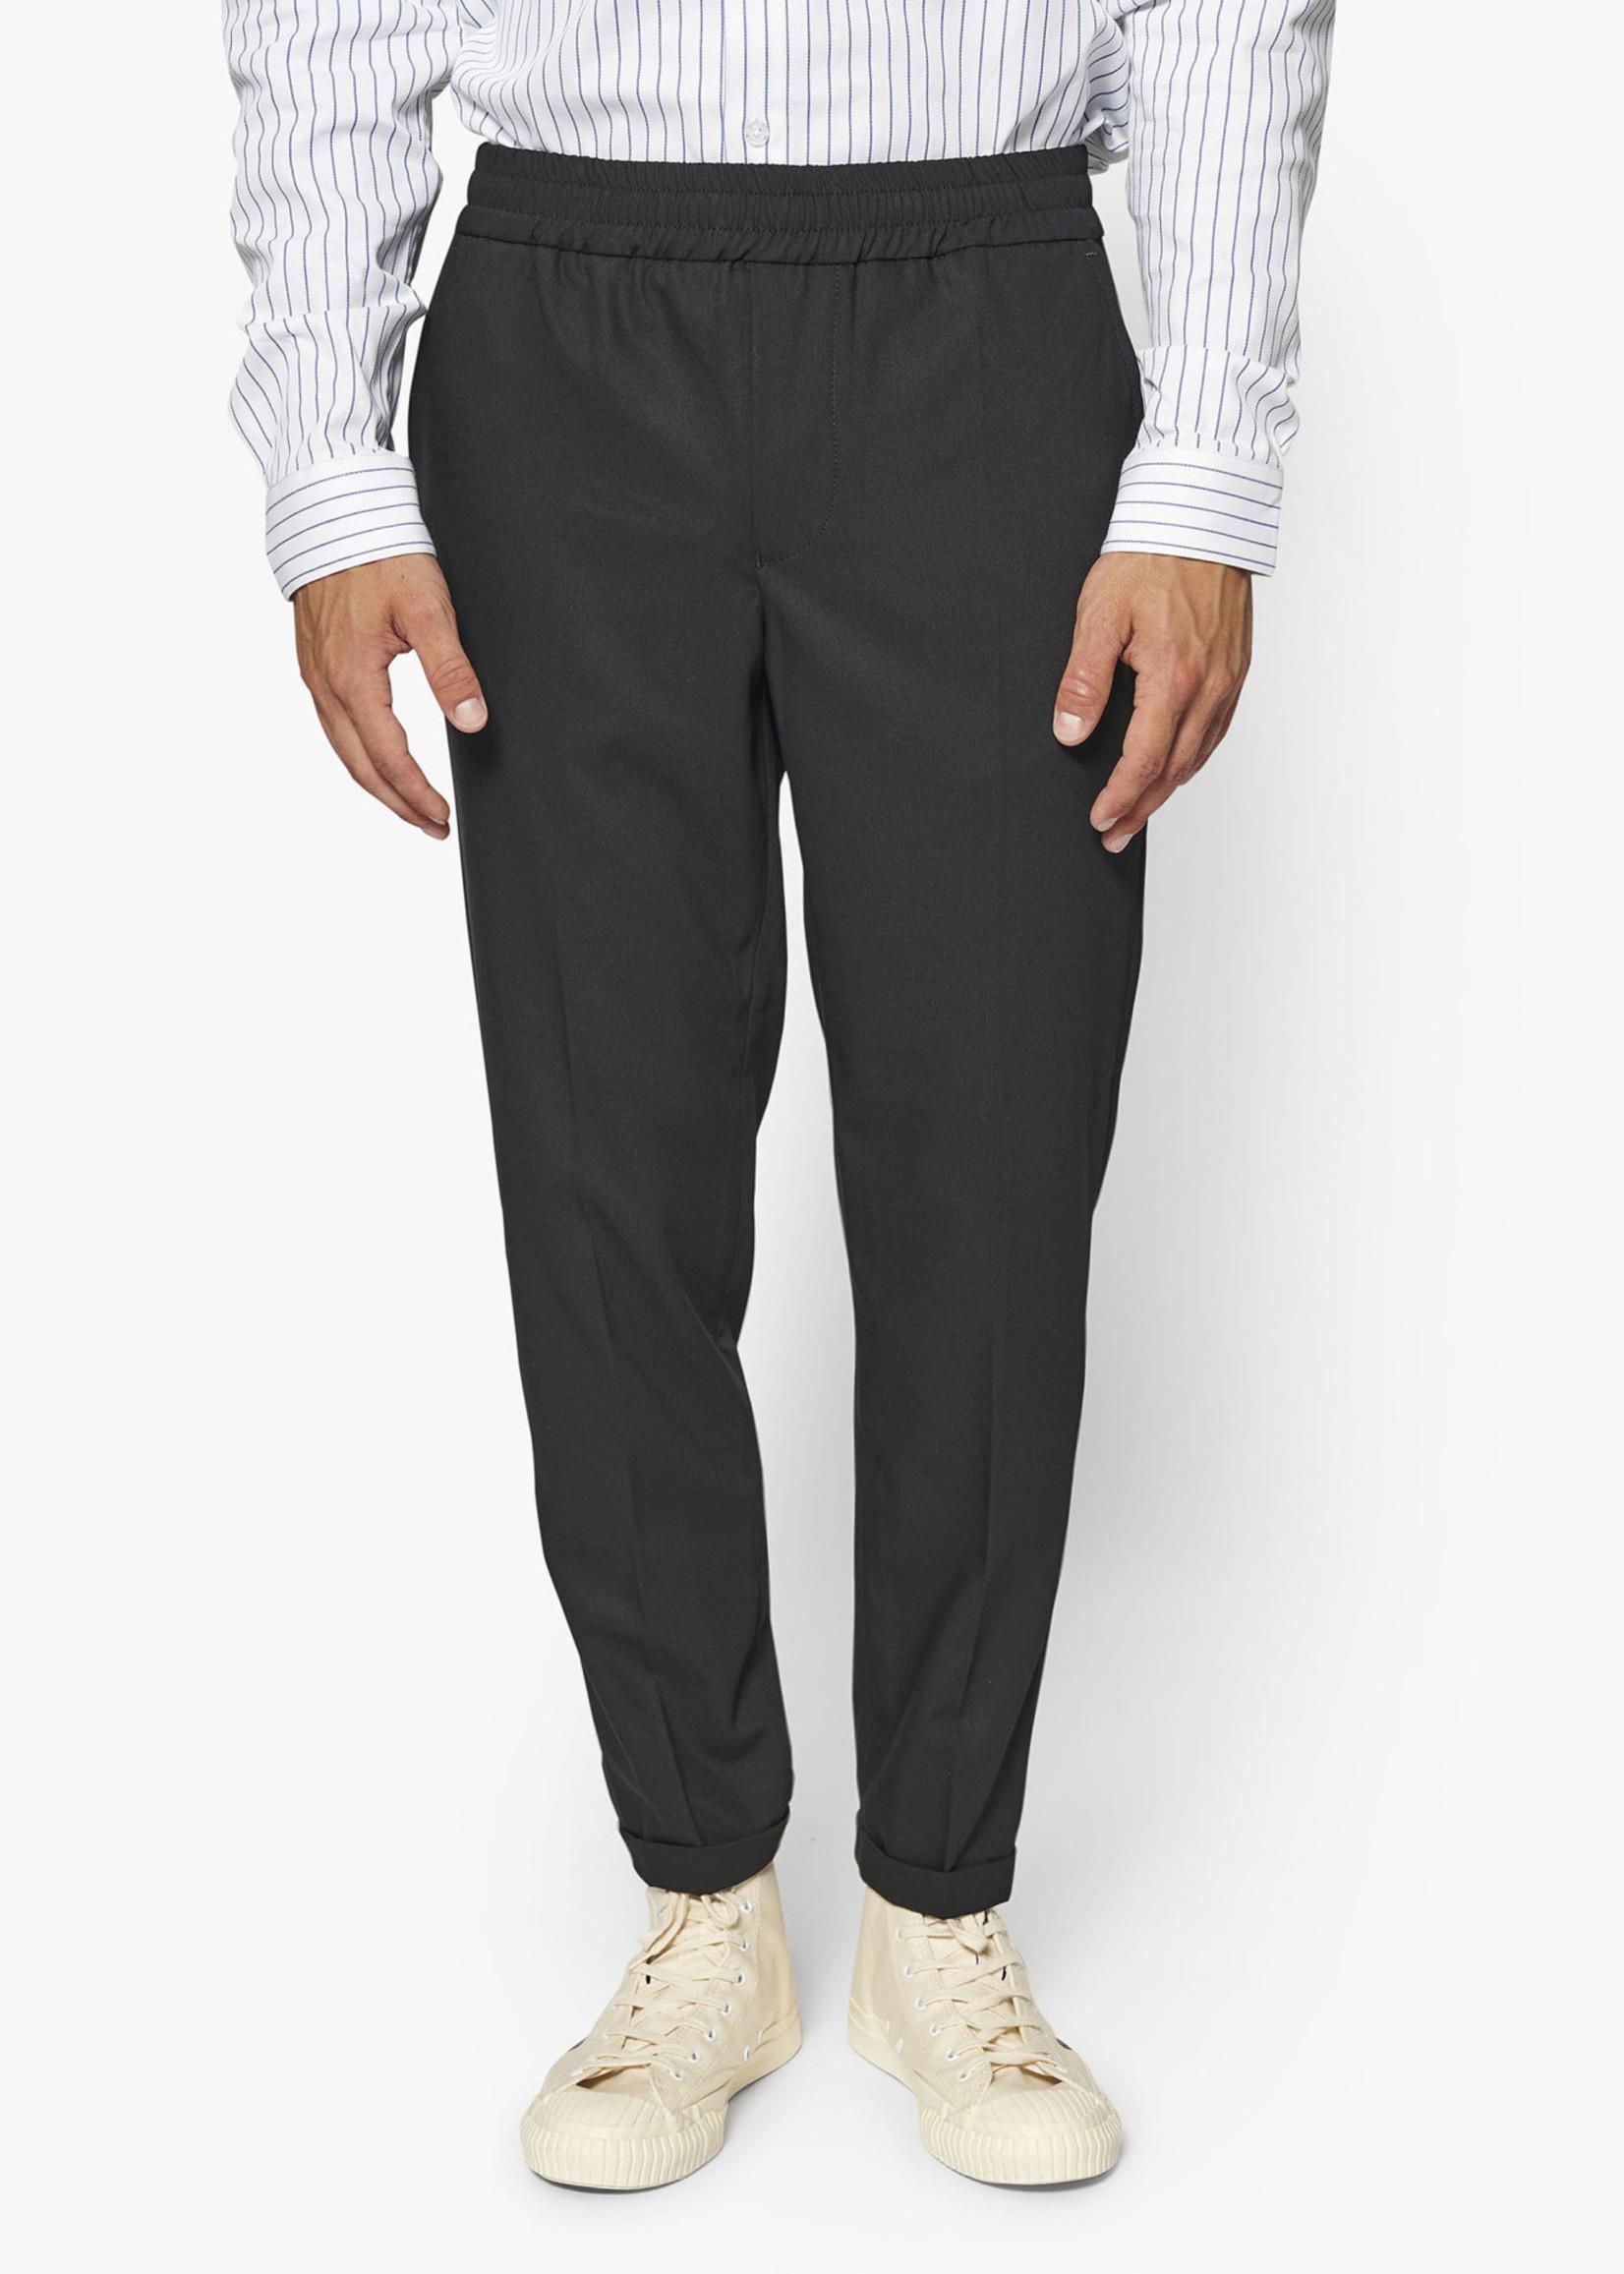 Woodbird Saul Nickel pants